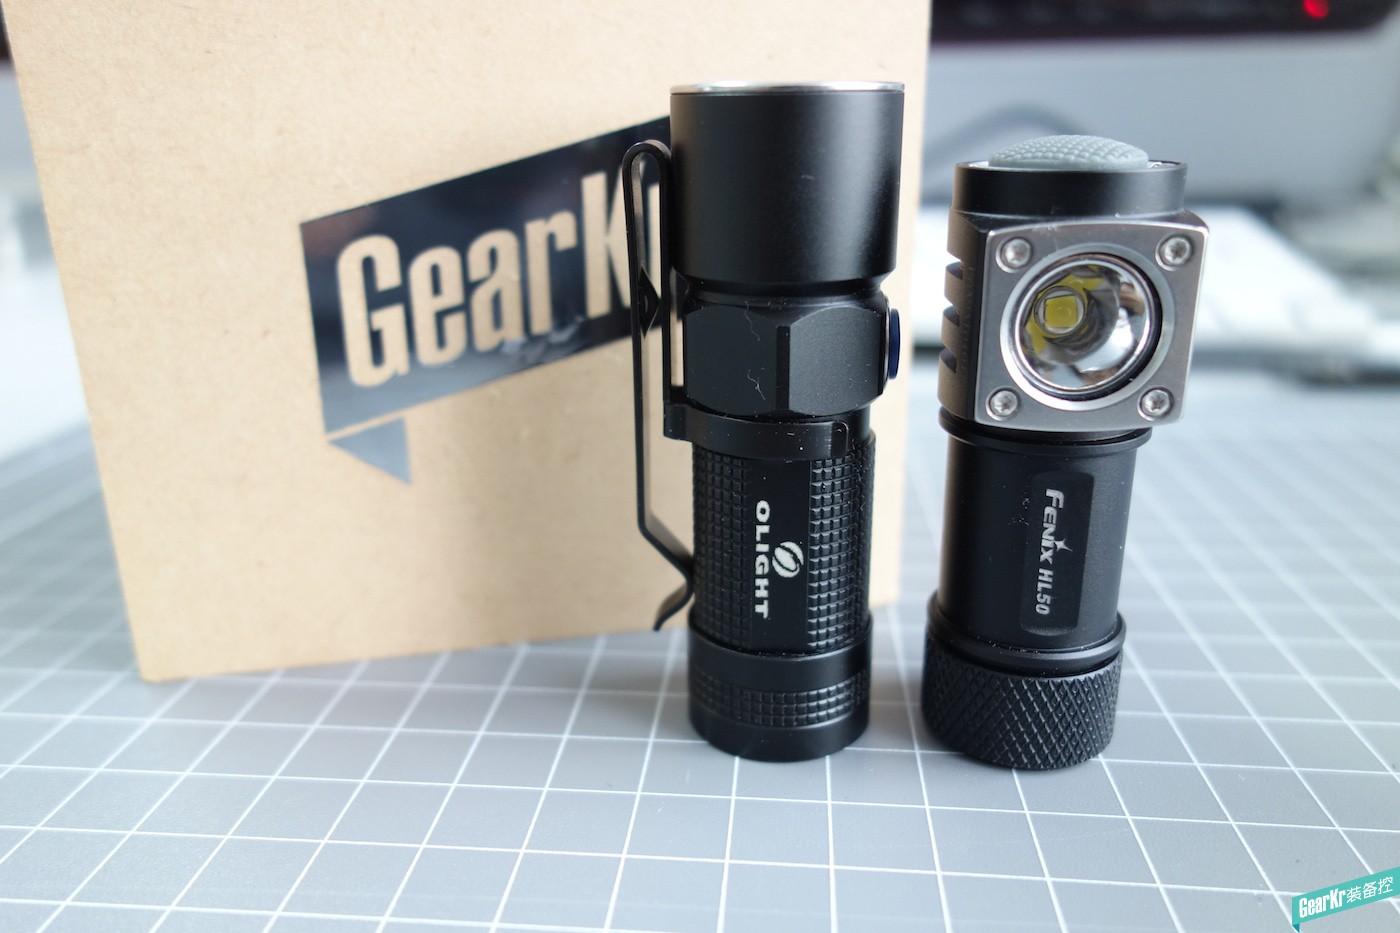 Fenix HL50和OLIGHT S10对比测评,到底谁是EDC手电霸王?